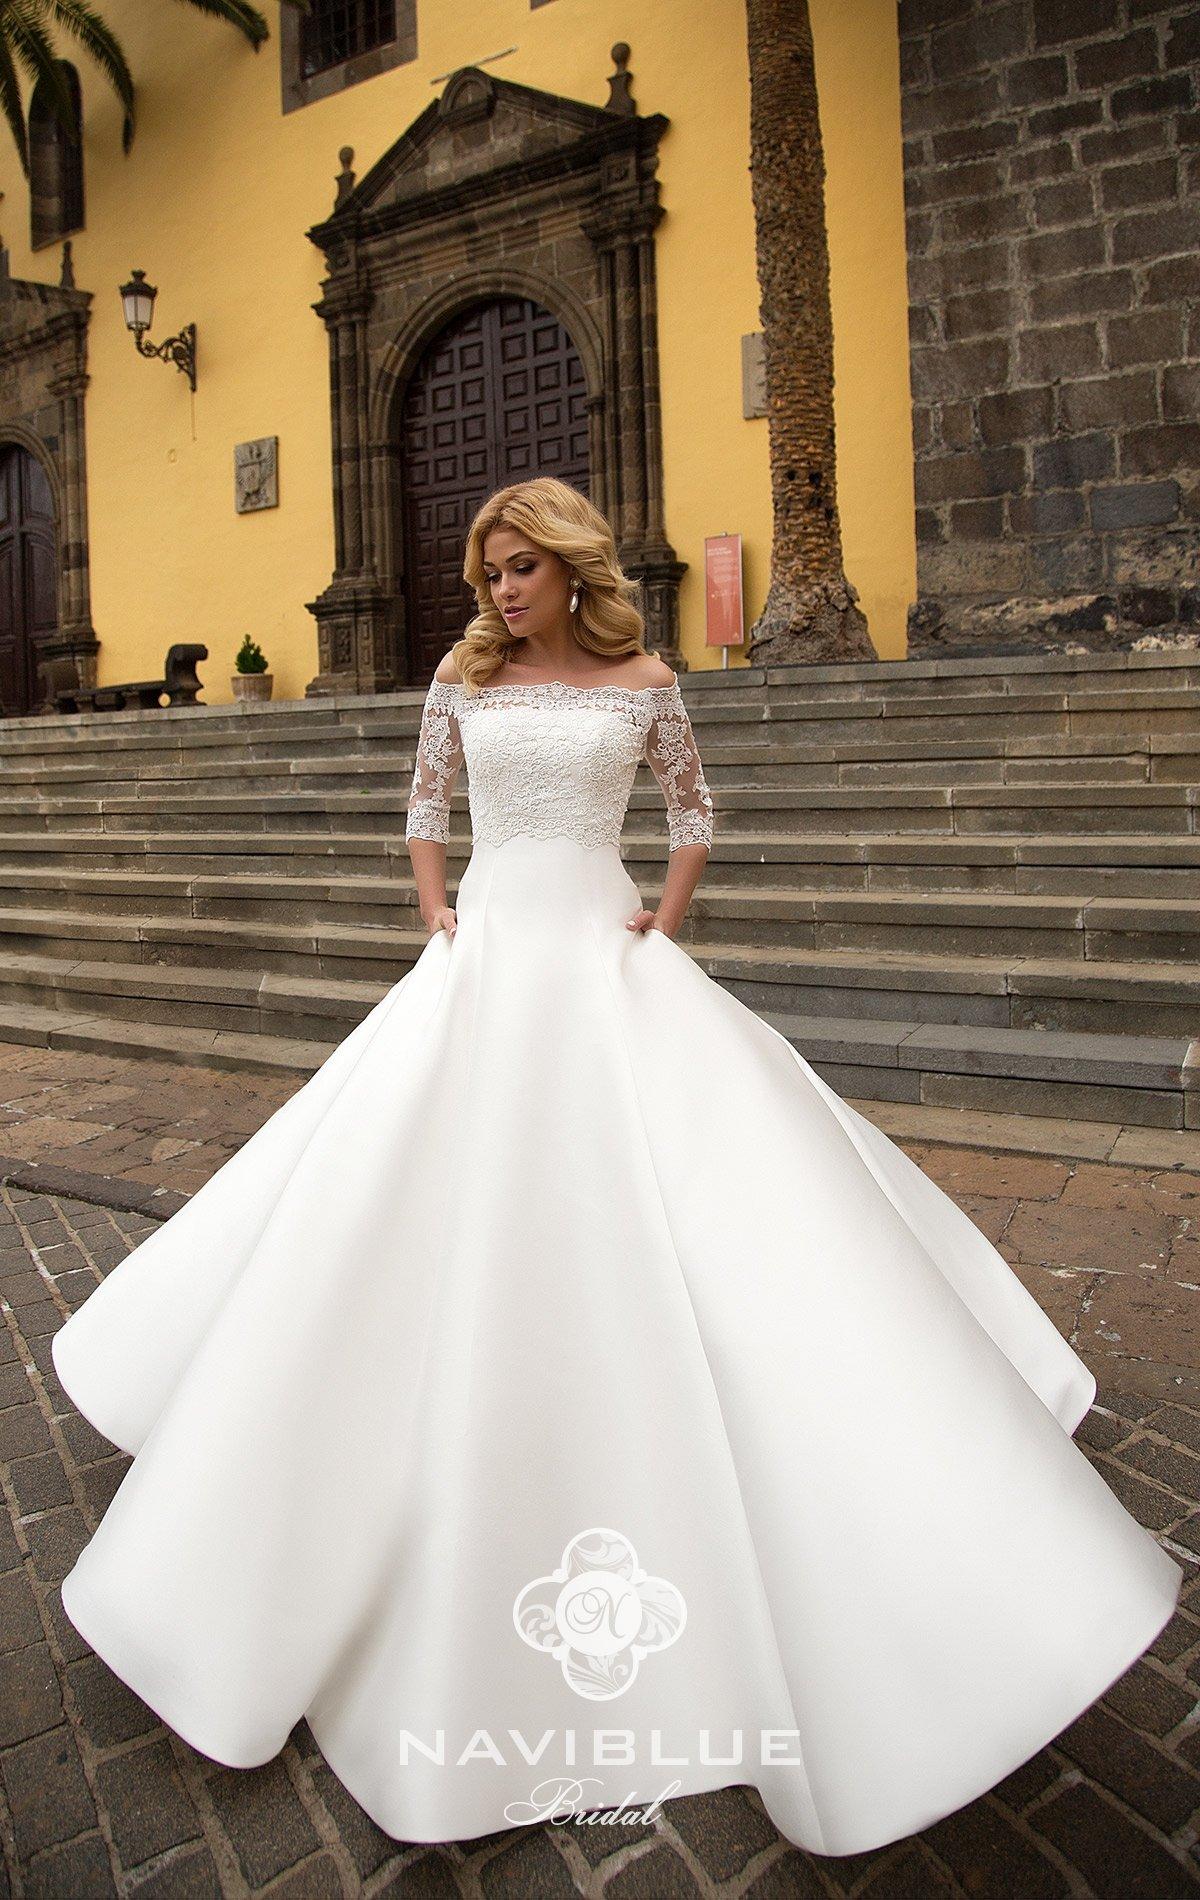 full_LEONA-16499_1 valentinos bridal ohio_.jpg